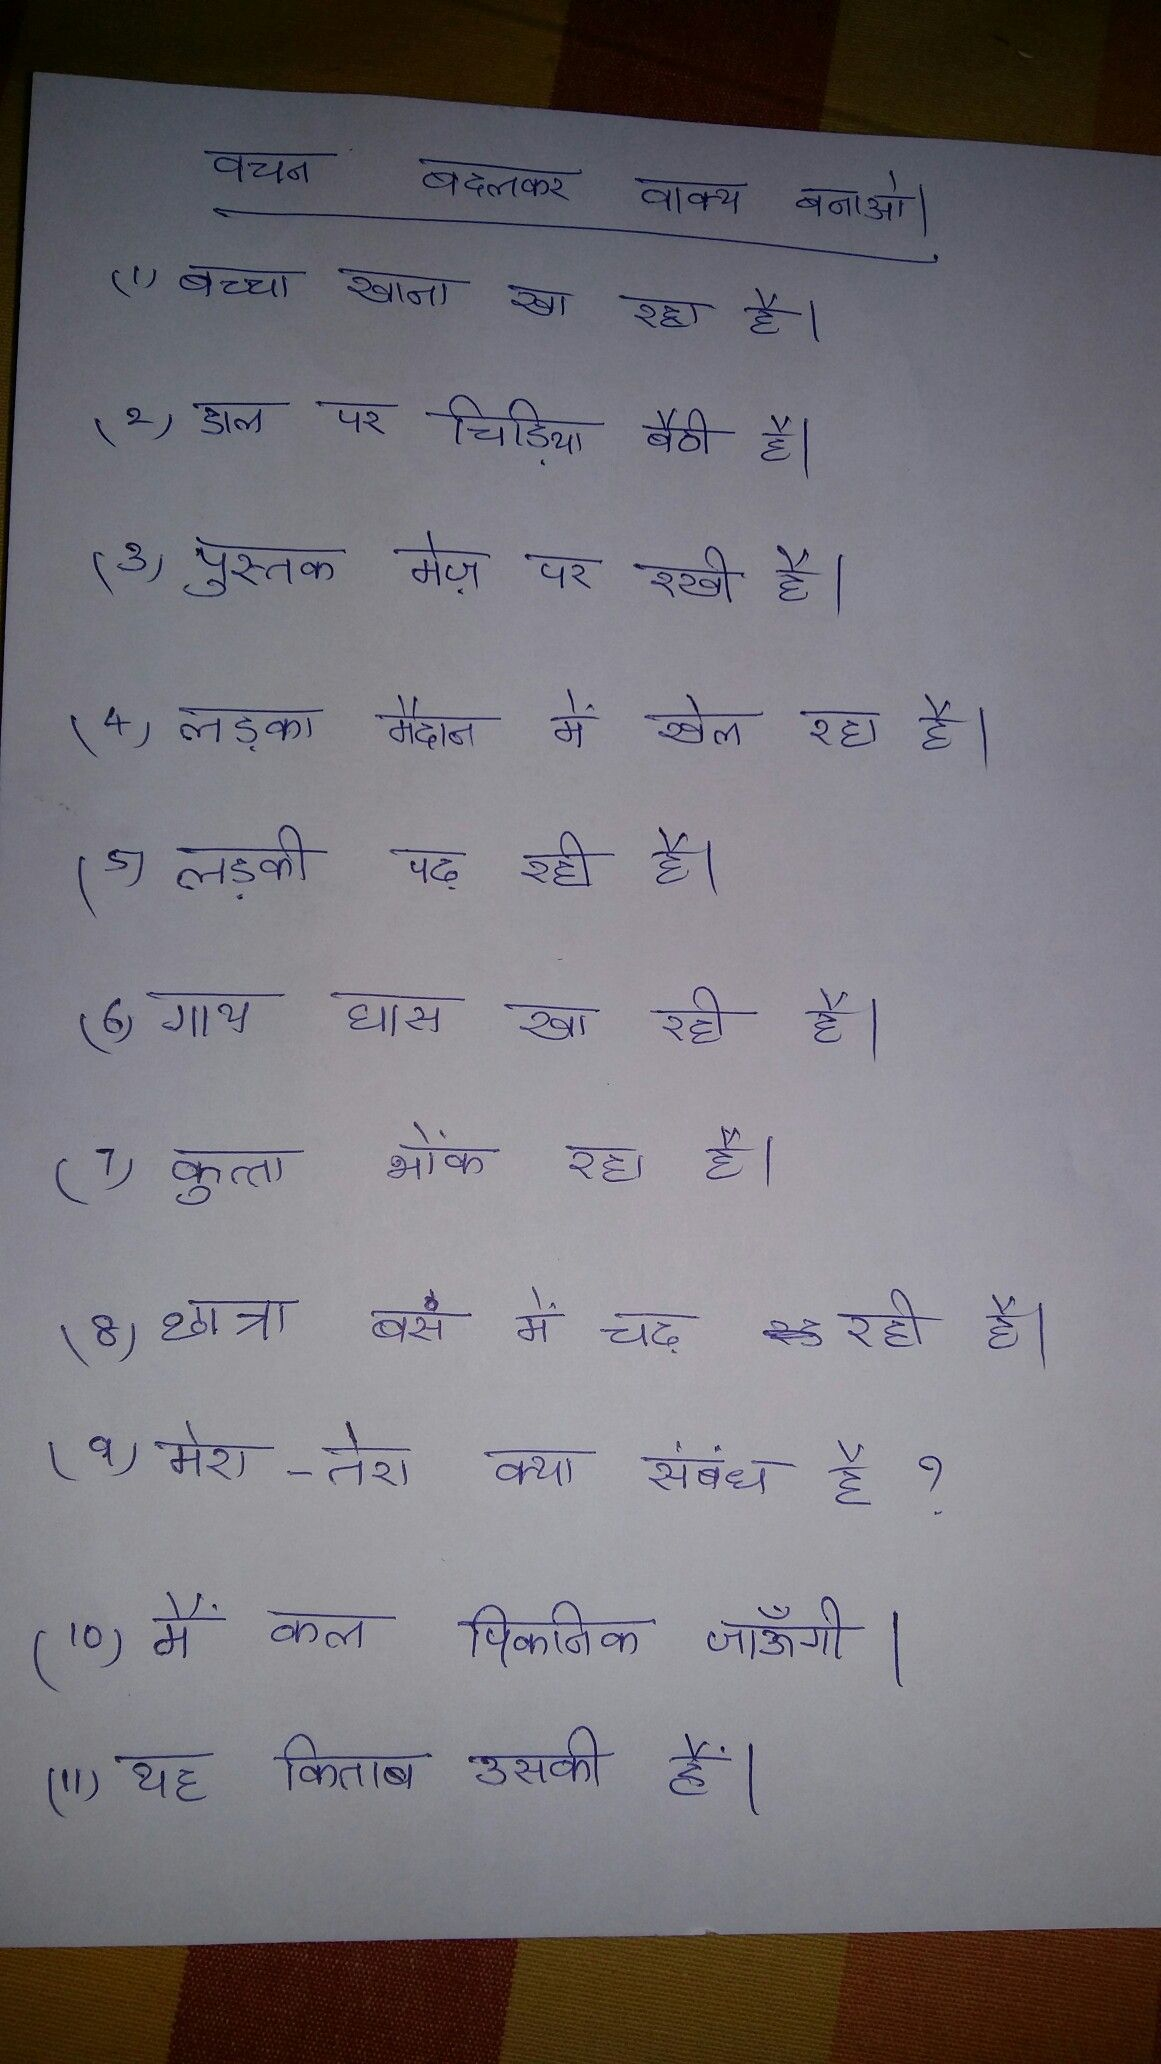 worksheet Hindi Grammar Worksheets For Class 8 Cbse hindi grammar vachan worksheet worksheets for school kids worksheet